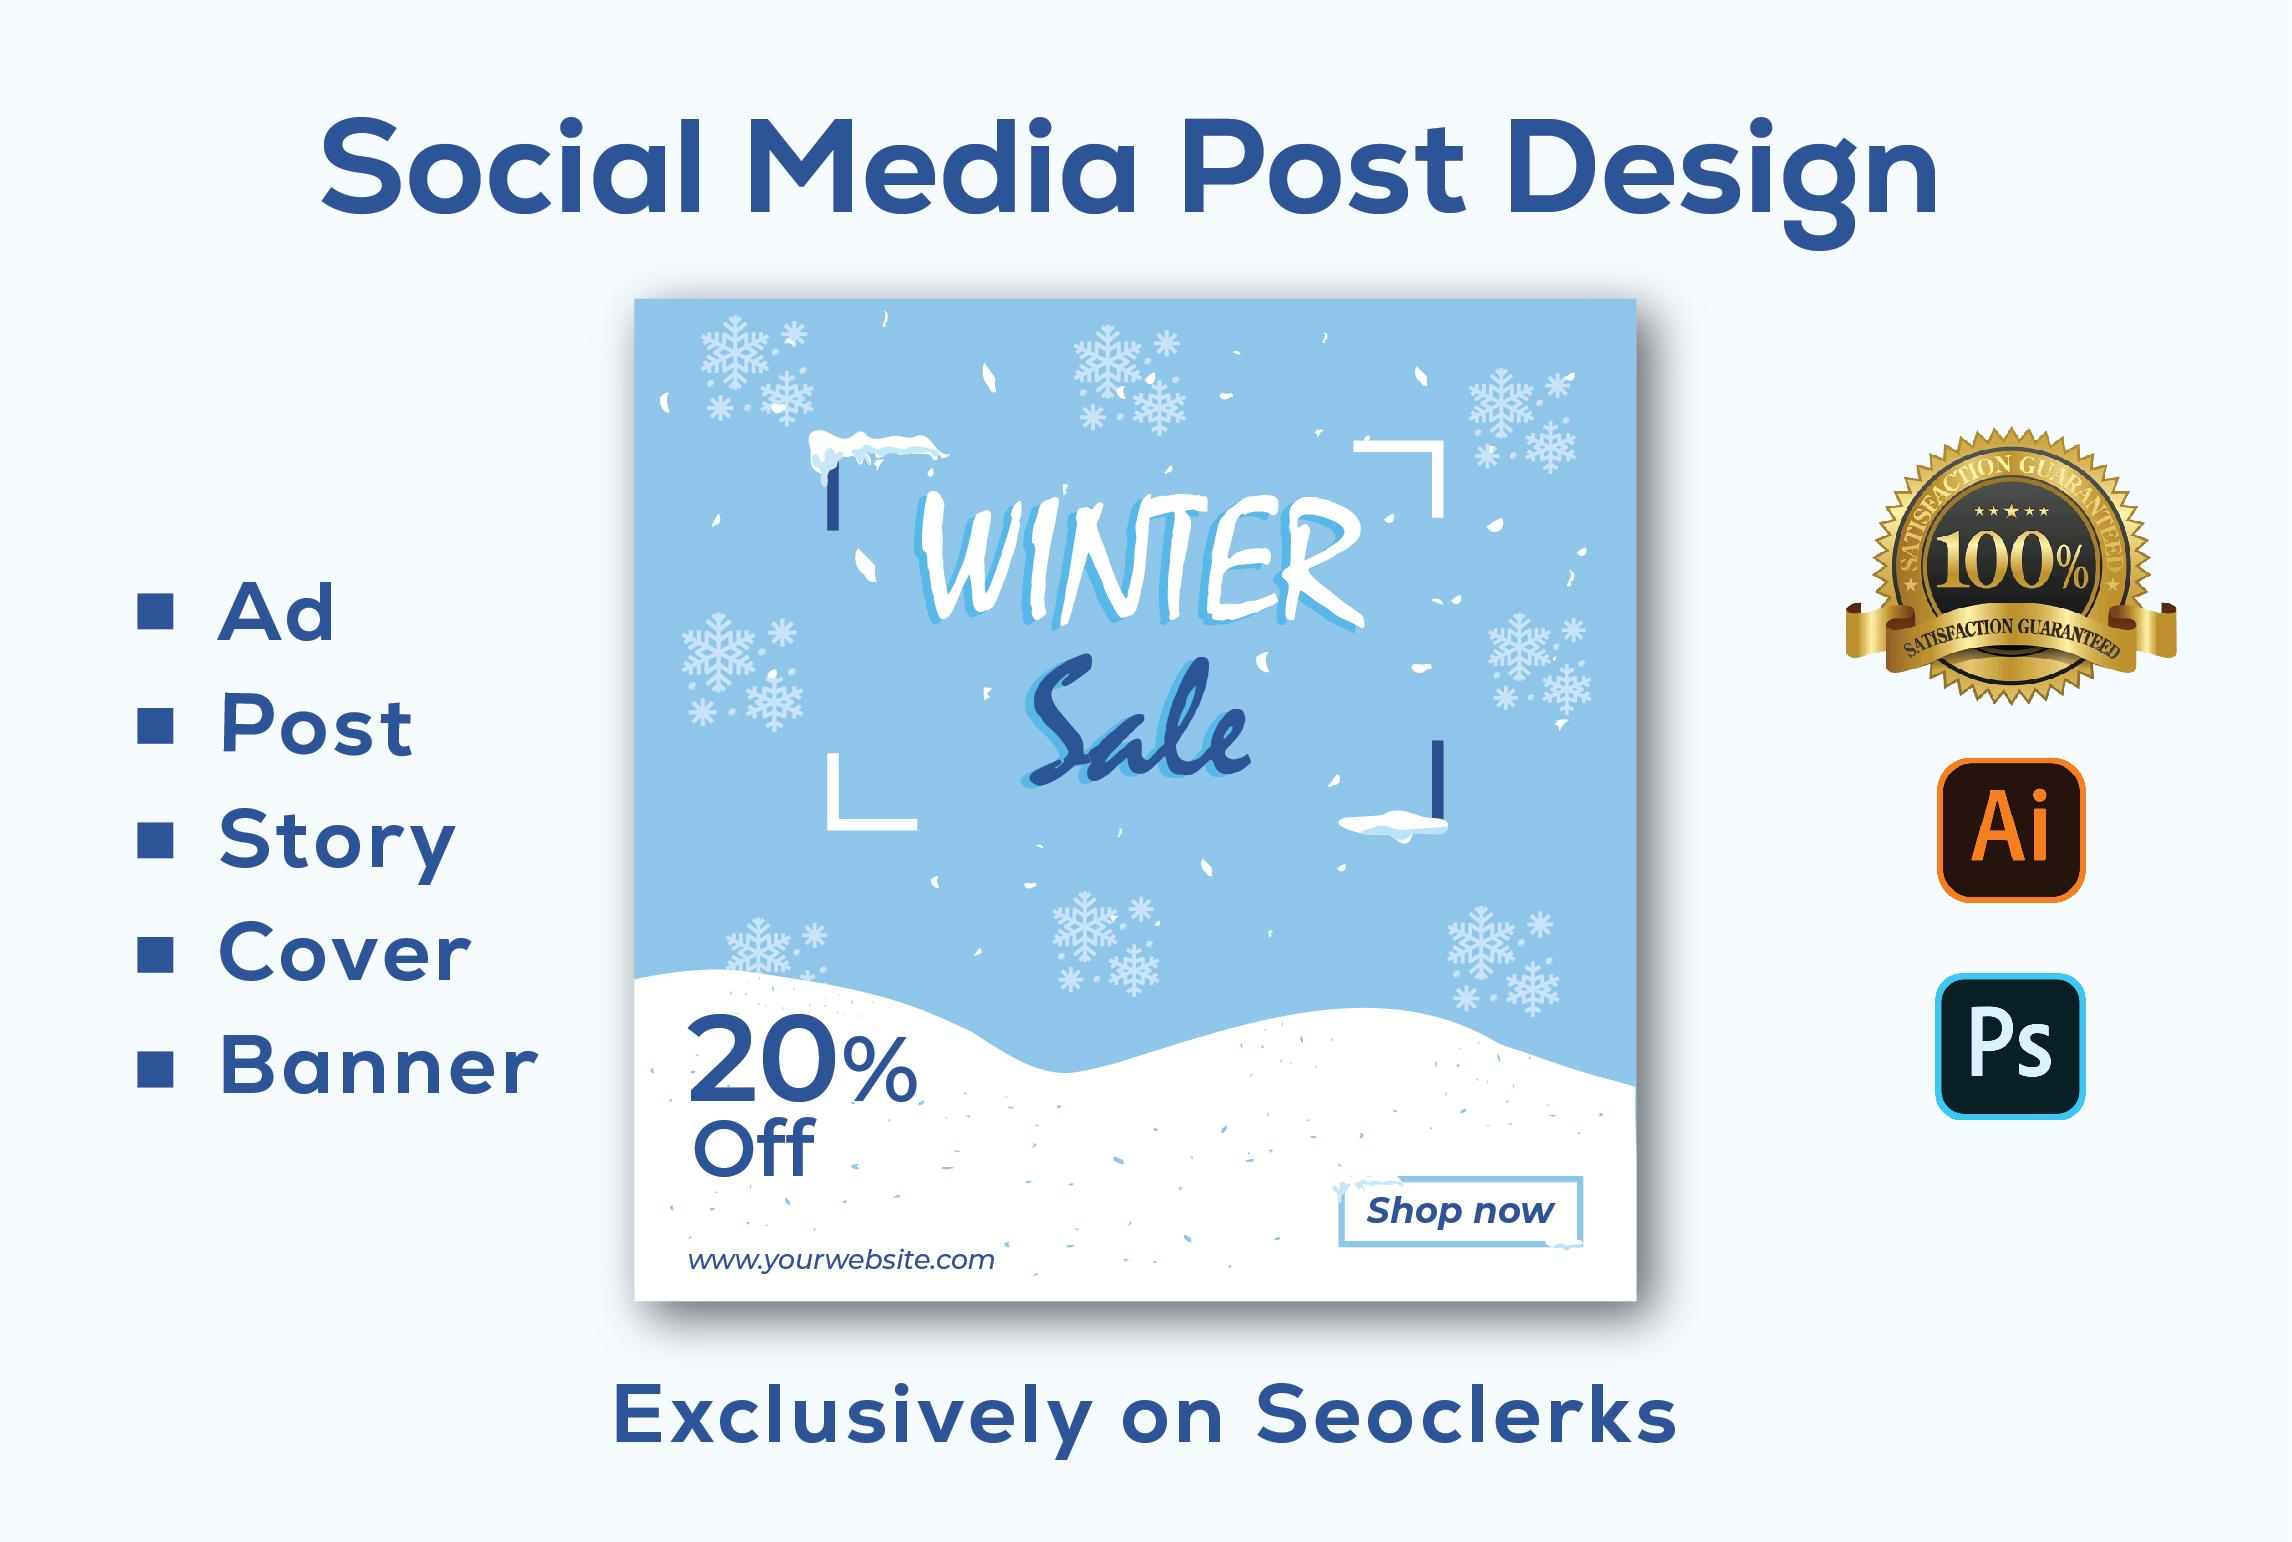 I will create unique and creative social media posts designs